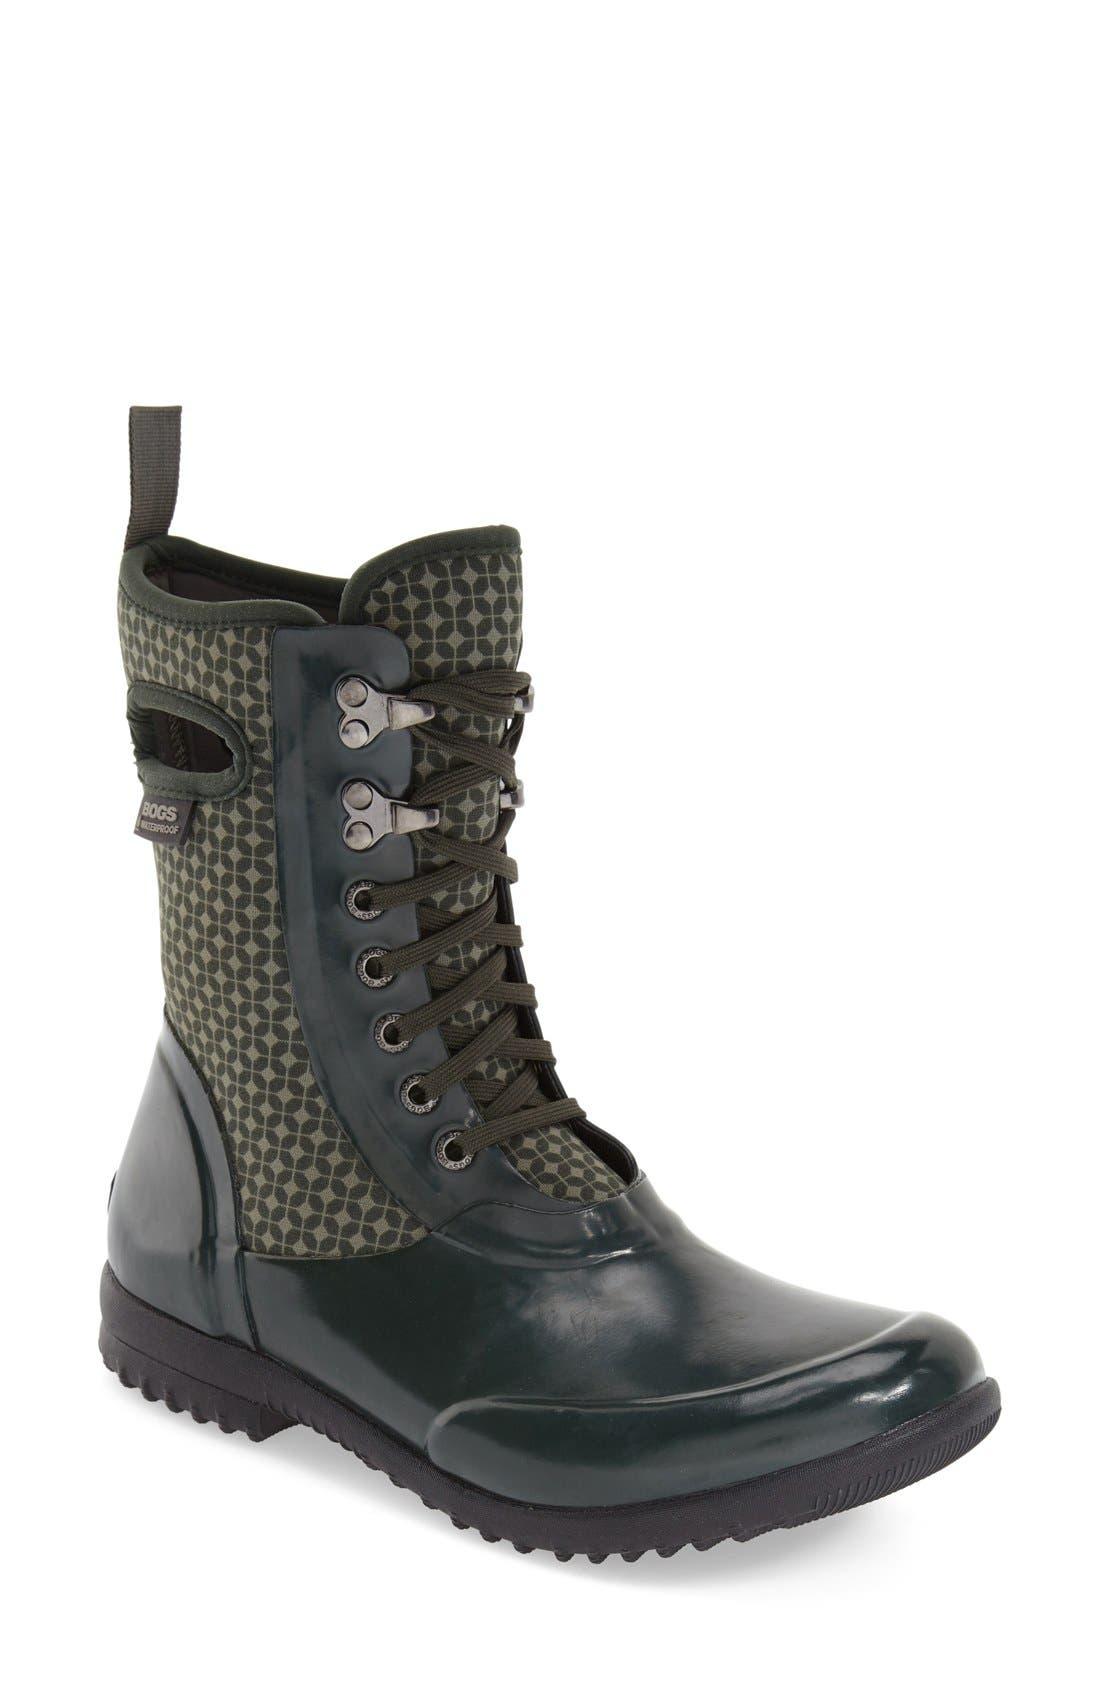 Alternate Image 1 Selected - Bogs 'Sidney Cravat' Lace-Up Waterproof Boot (Women)